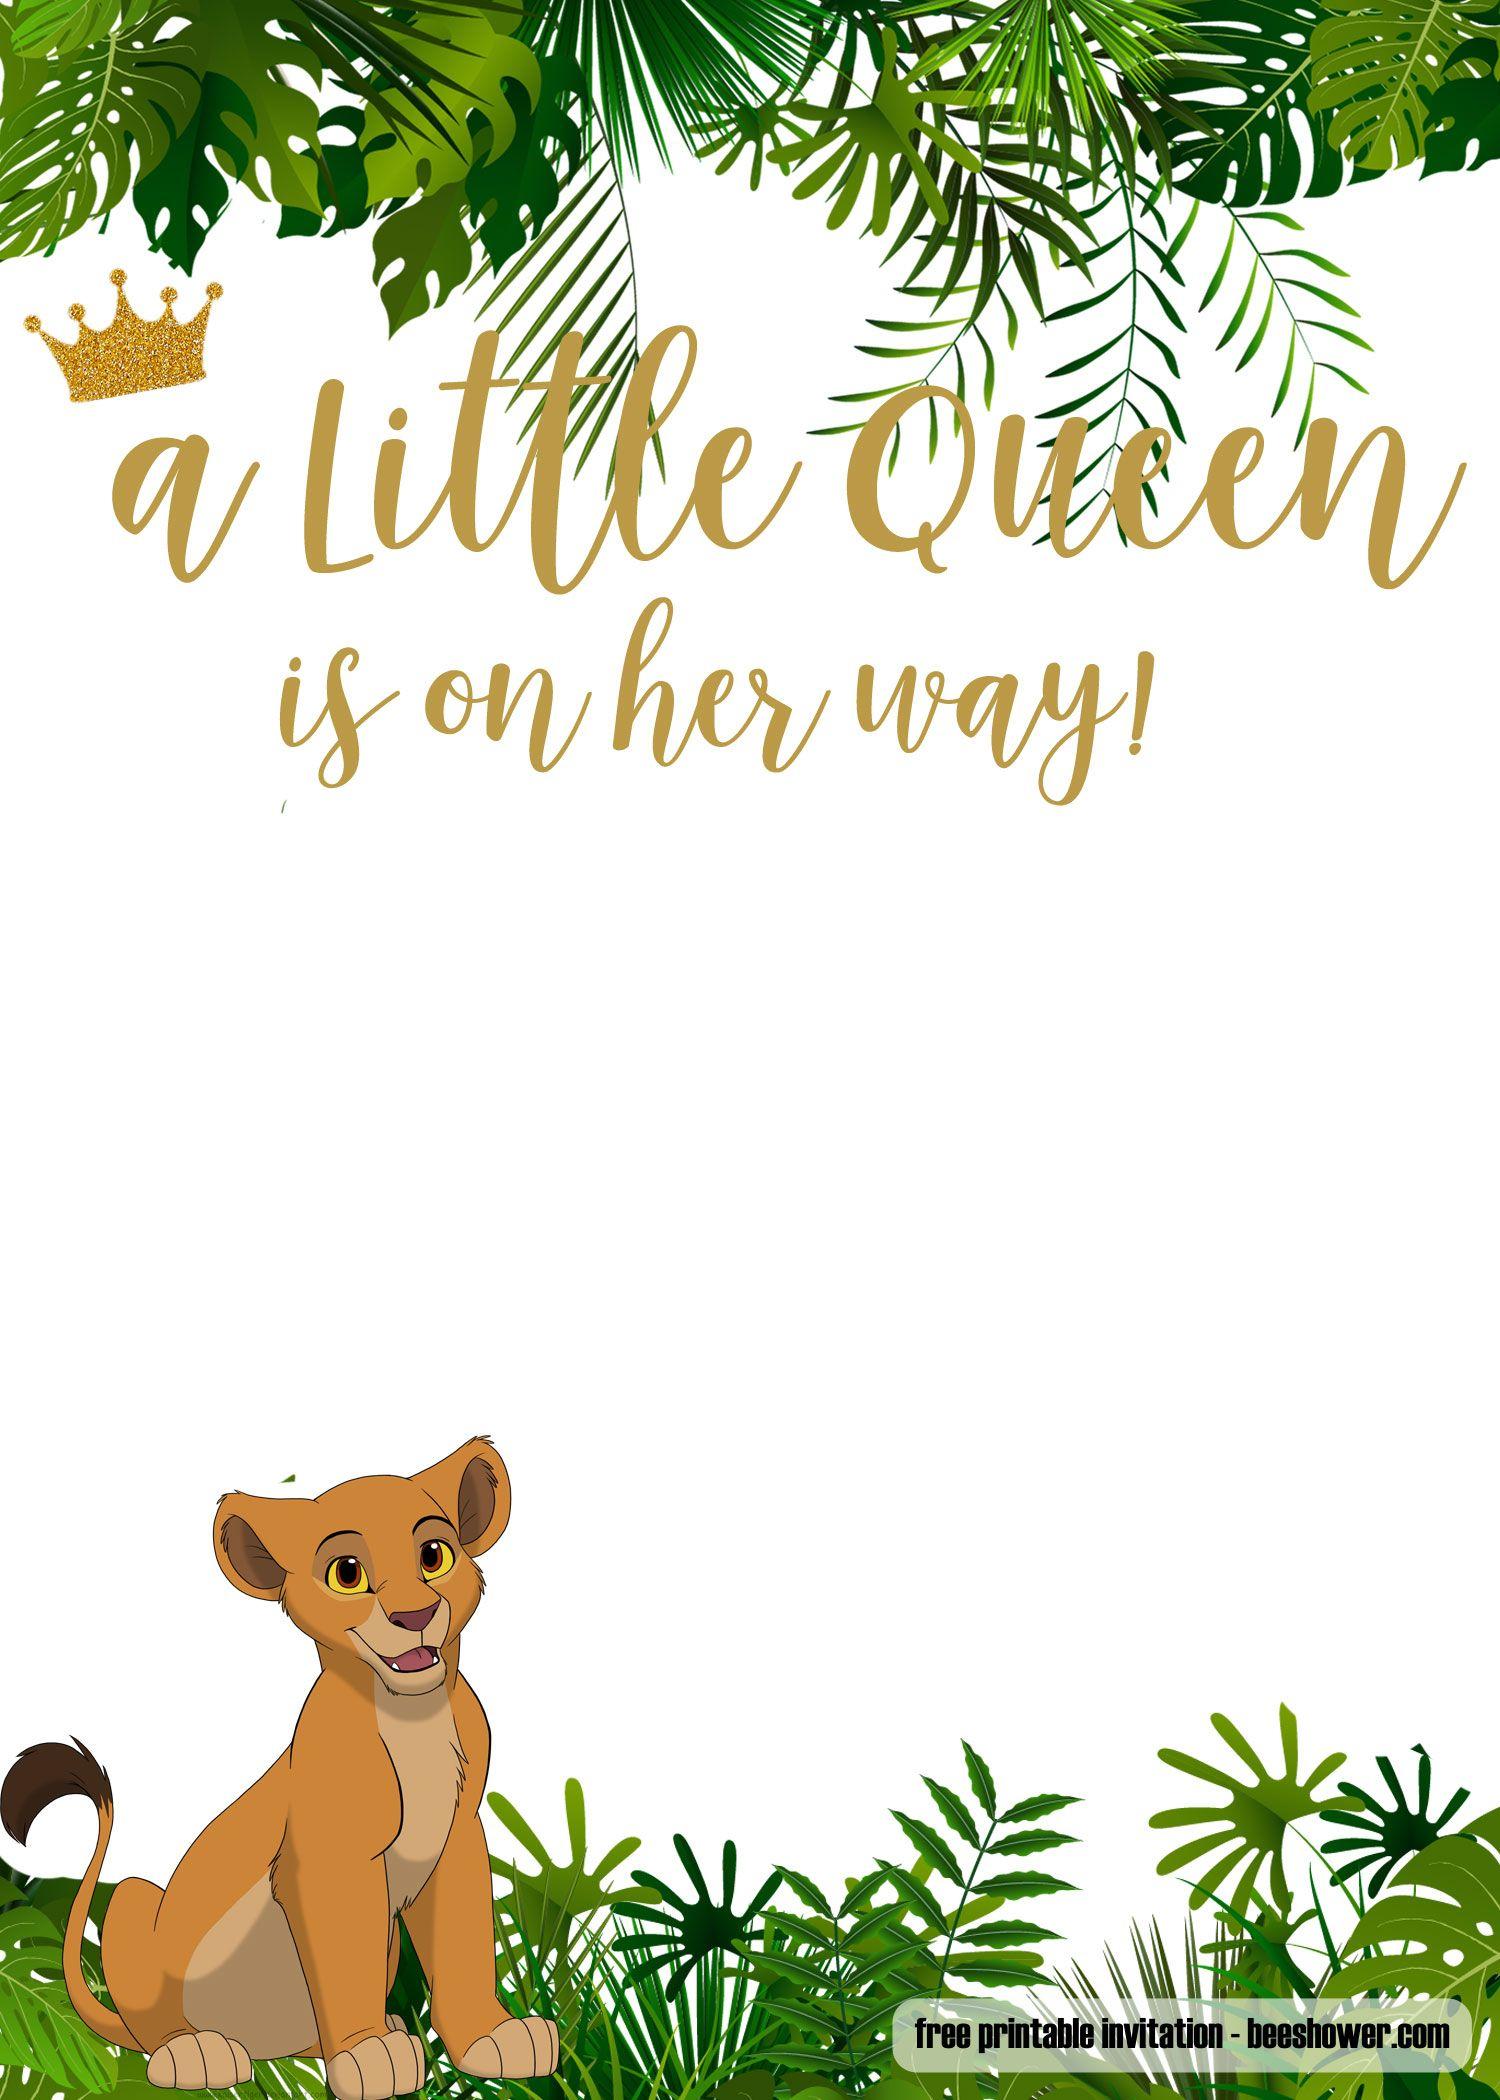 Free Printable Lion King Baby Shower Invitations | Free Printable - Free Printable Lion King Baby Shower Invitations